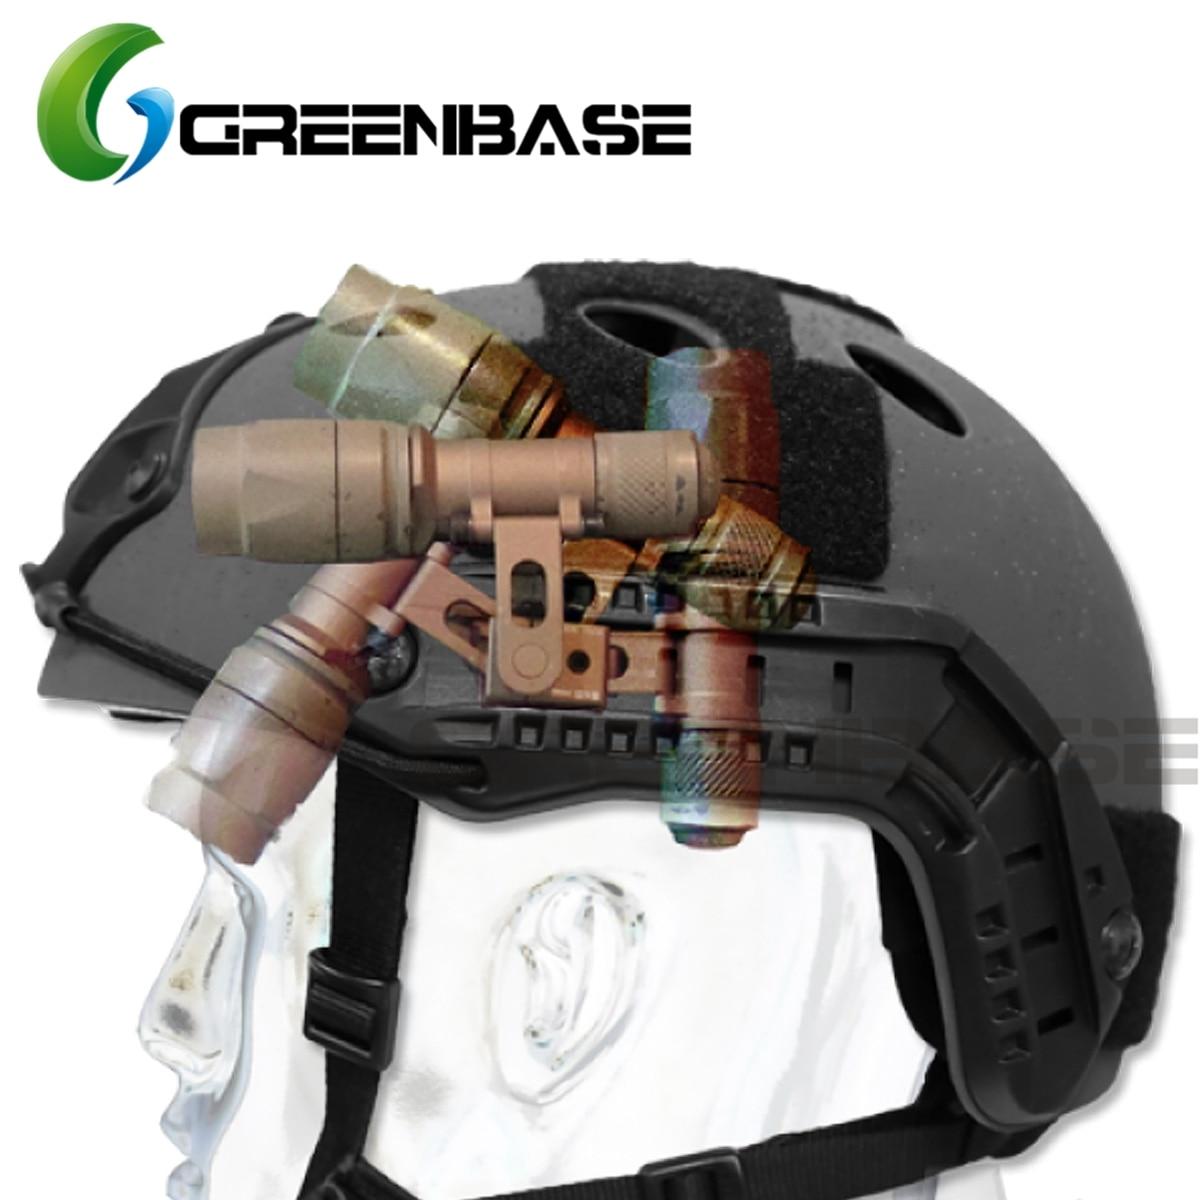 Us 156 46 Offprecision Low Profile Helmet Mount M300b M300c M300v Series Flashlight Mount For Arc Helmet Rail Intergrated Flashlight Mount In